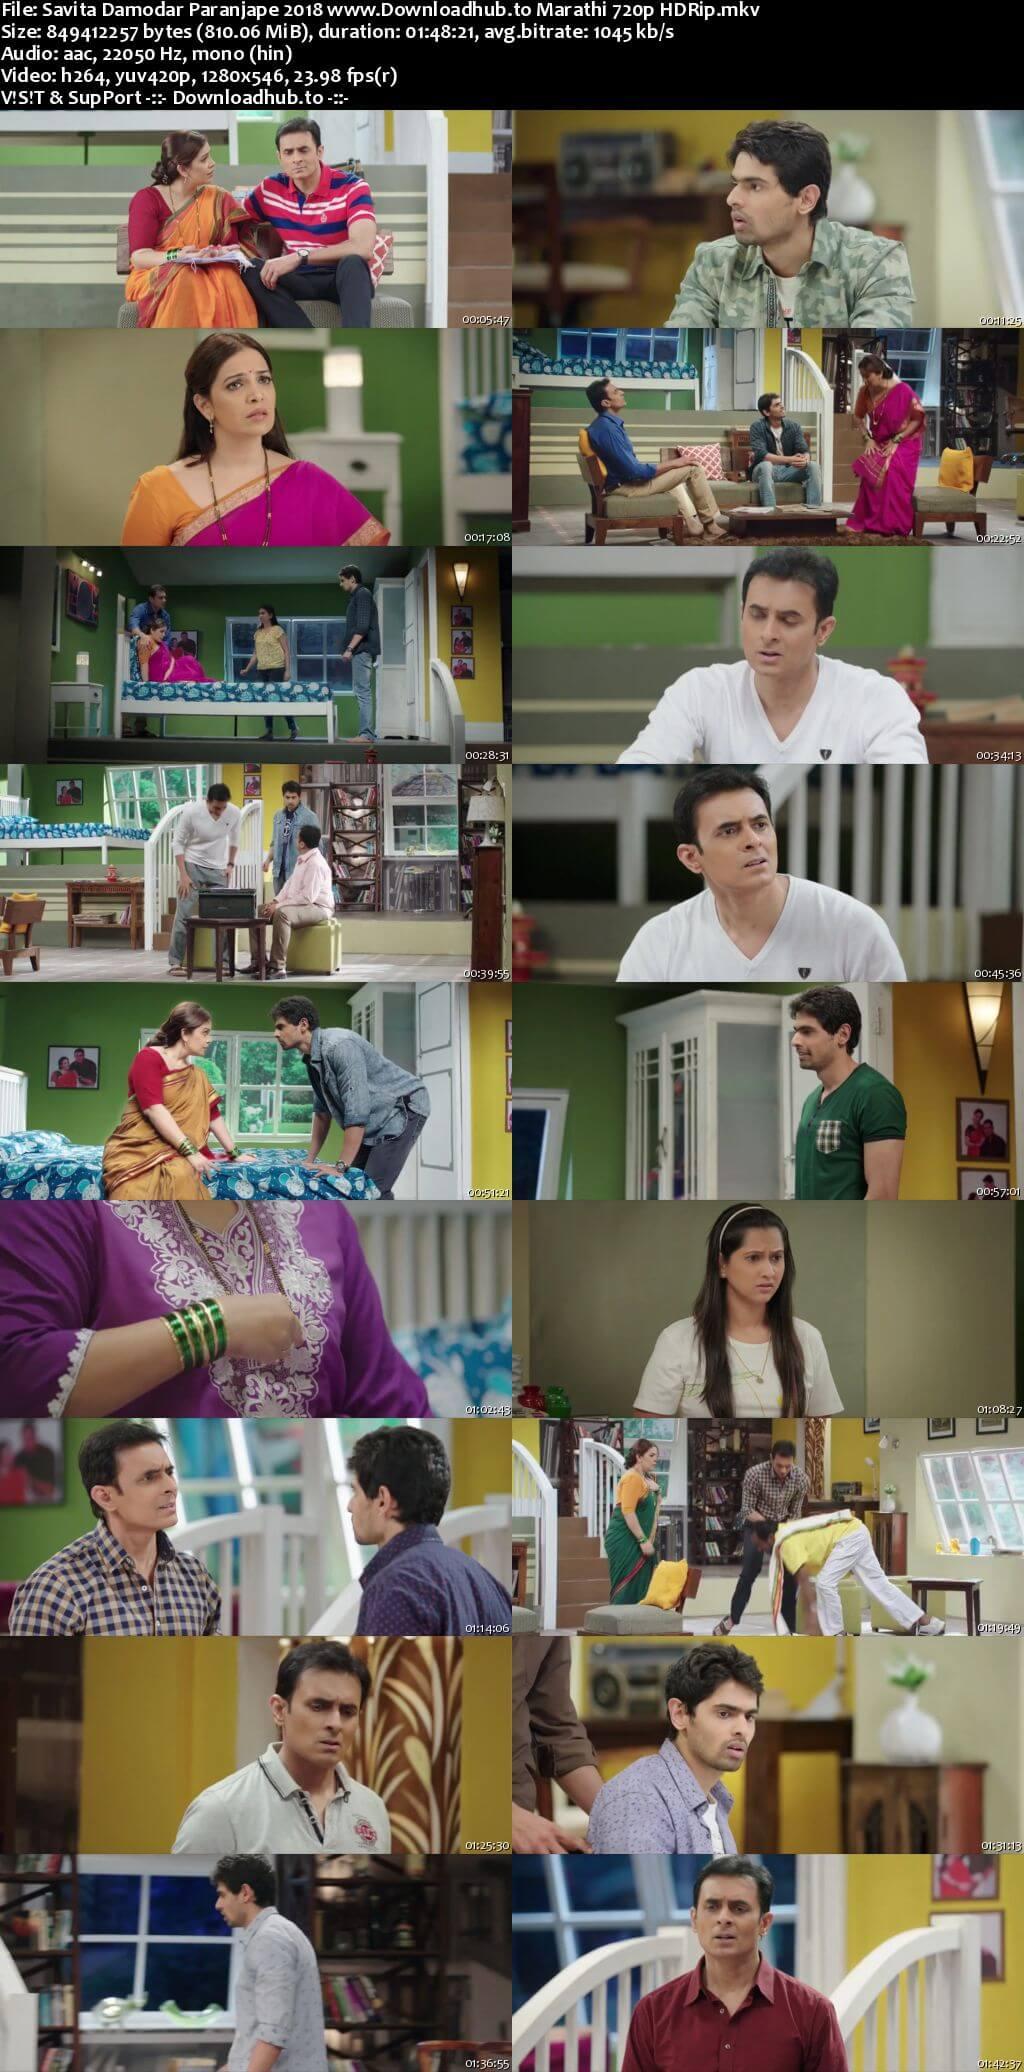 Savita Damodar Paranjpe 2018 Marathi 720p HDRip